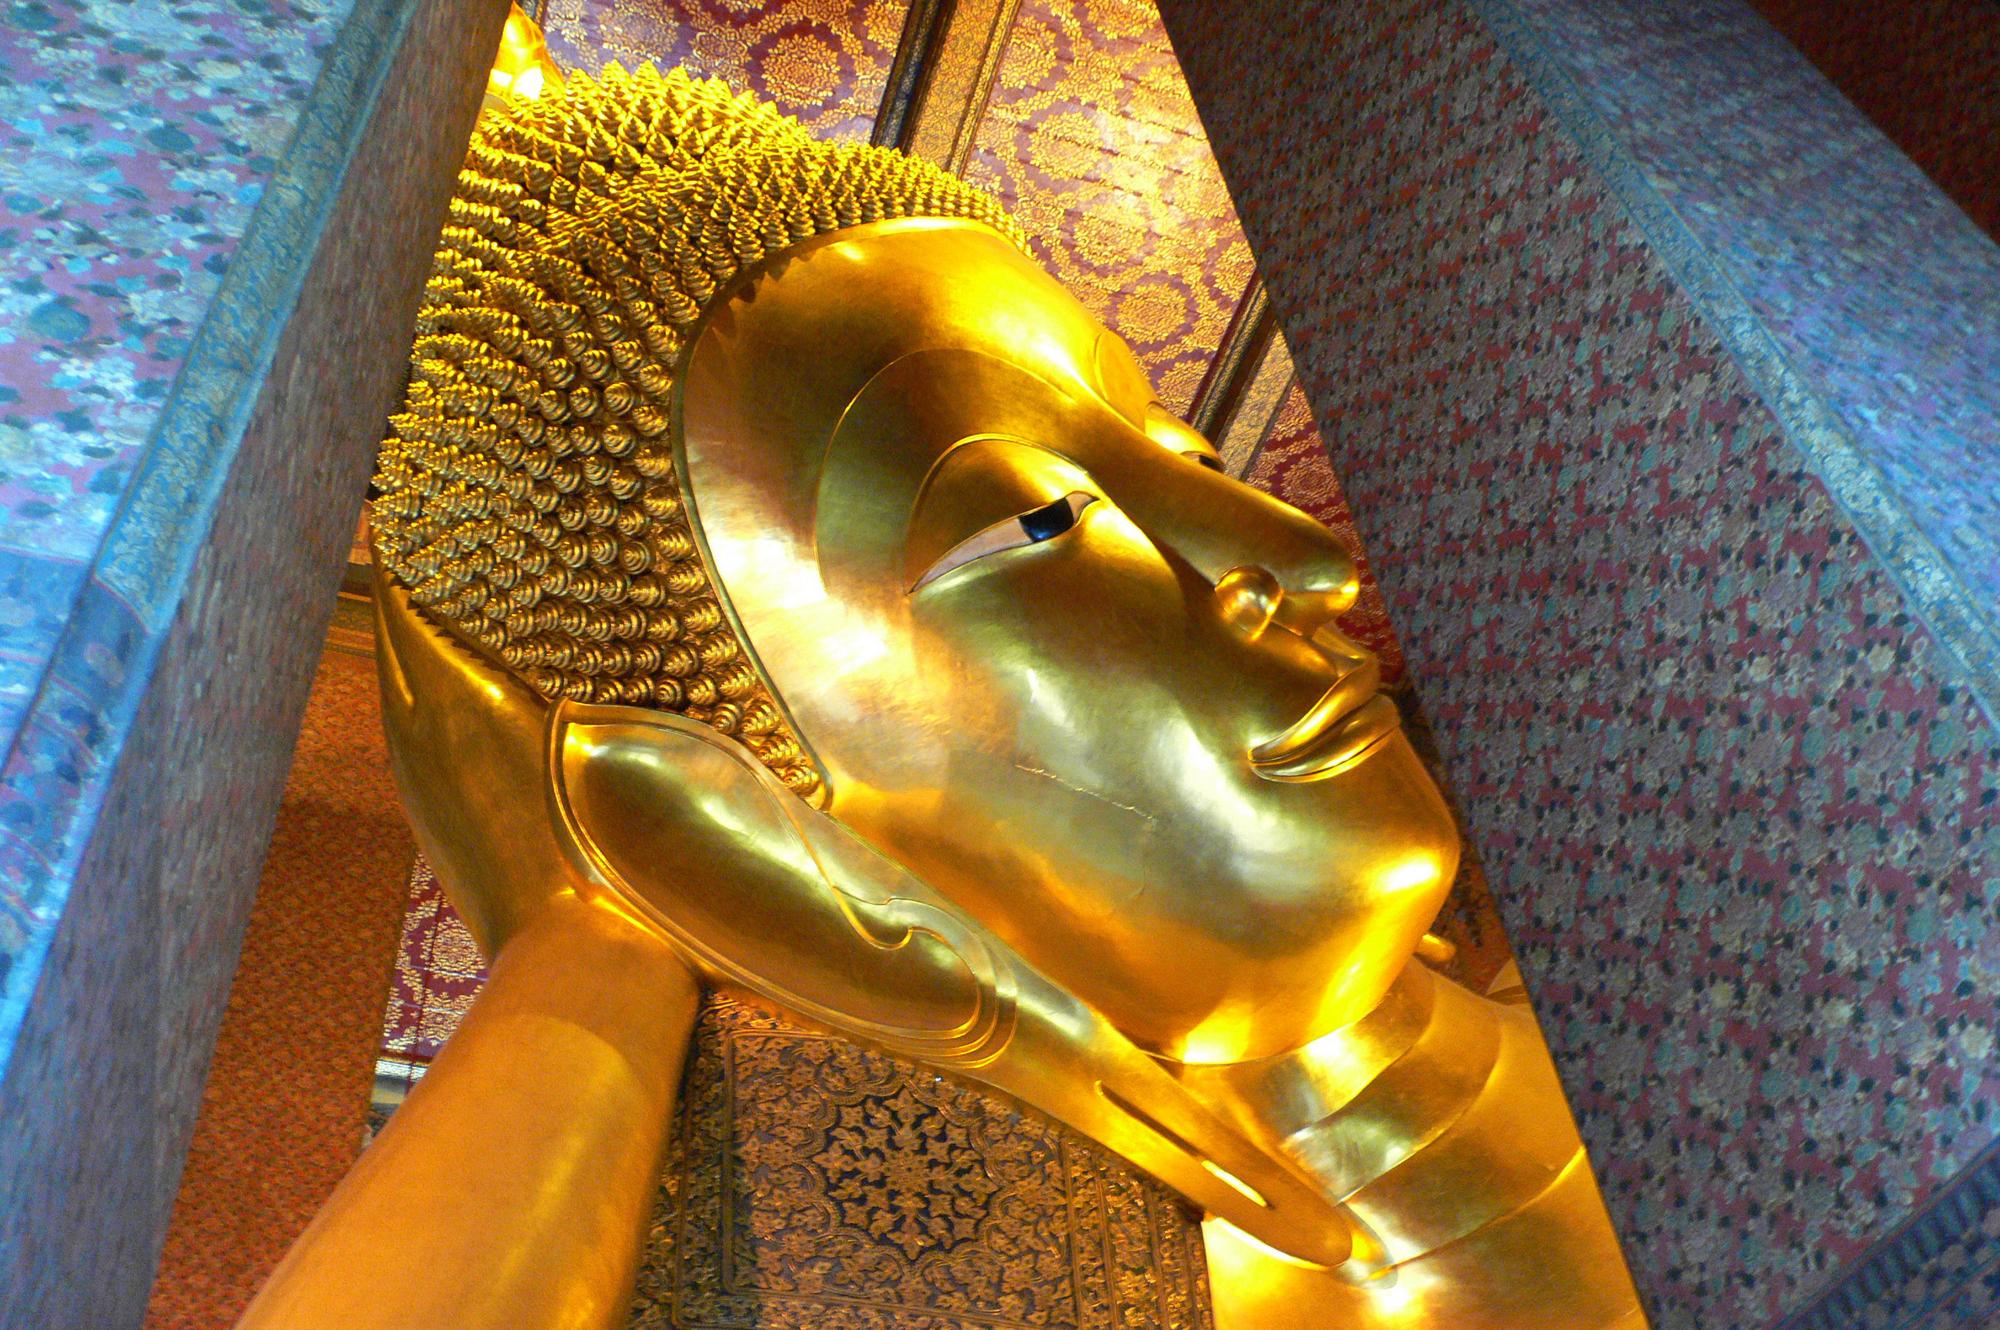 Thai Royal Palace & Temple 033